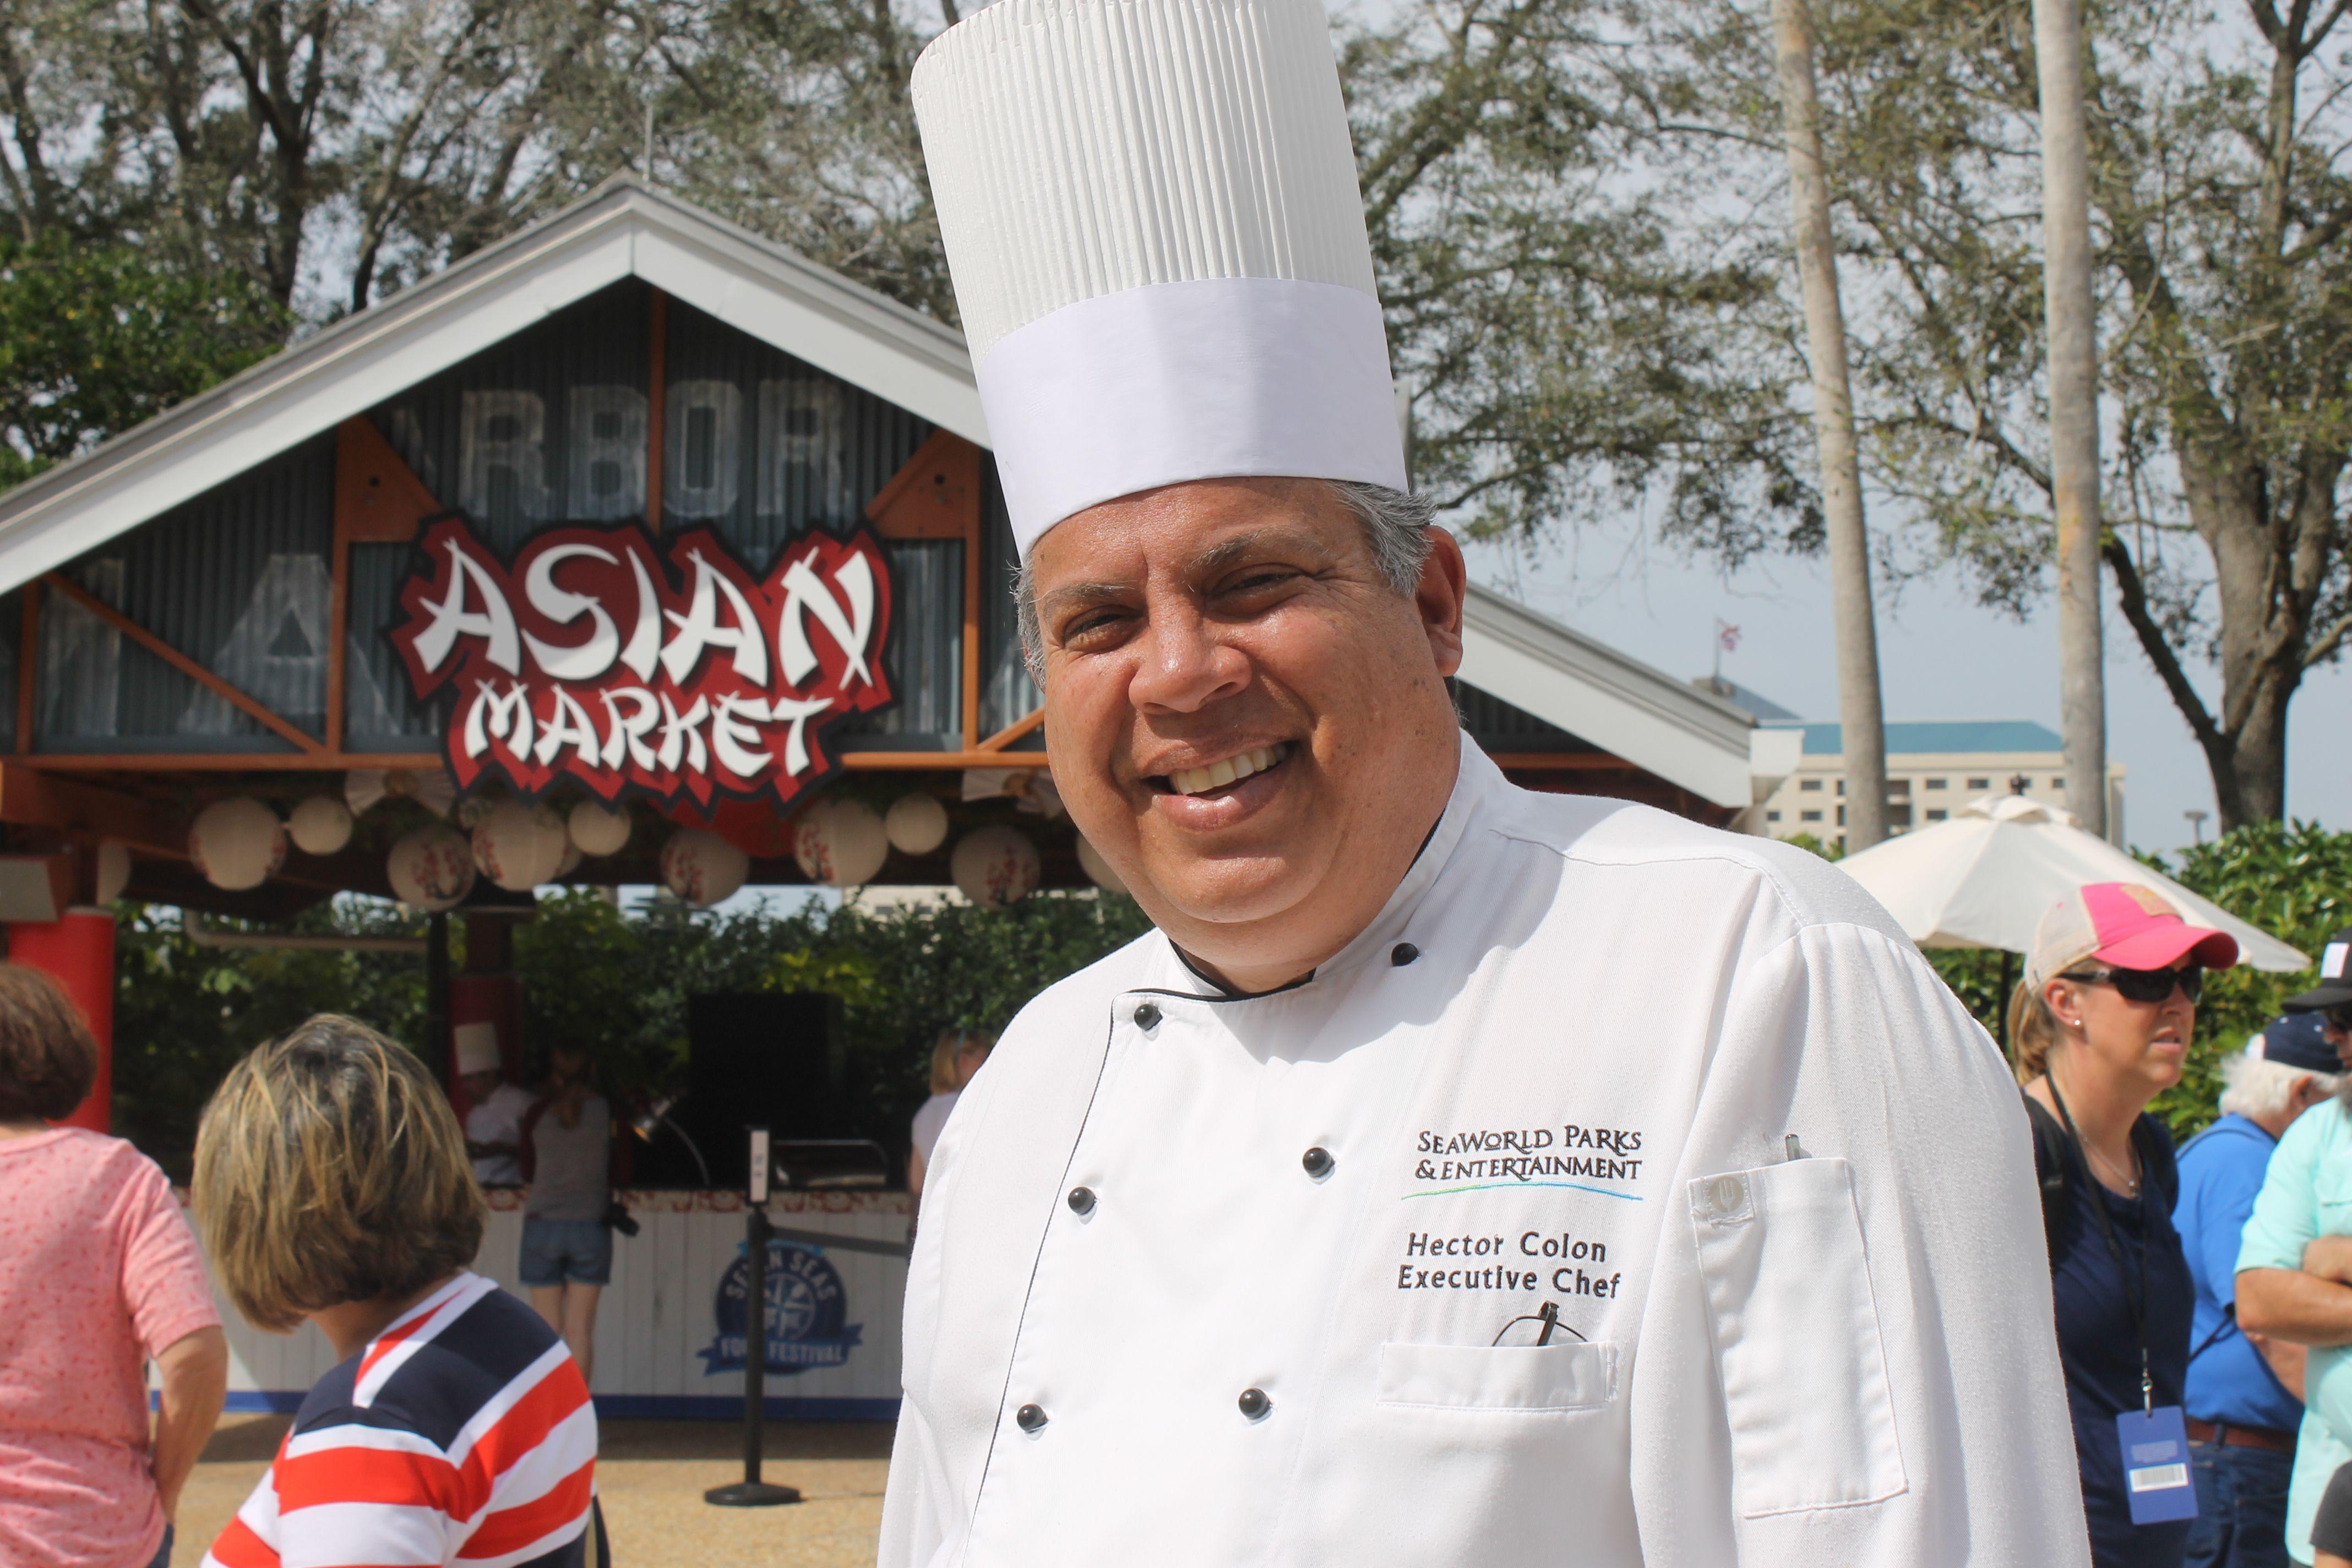 Chef SeaWorld Food Festival